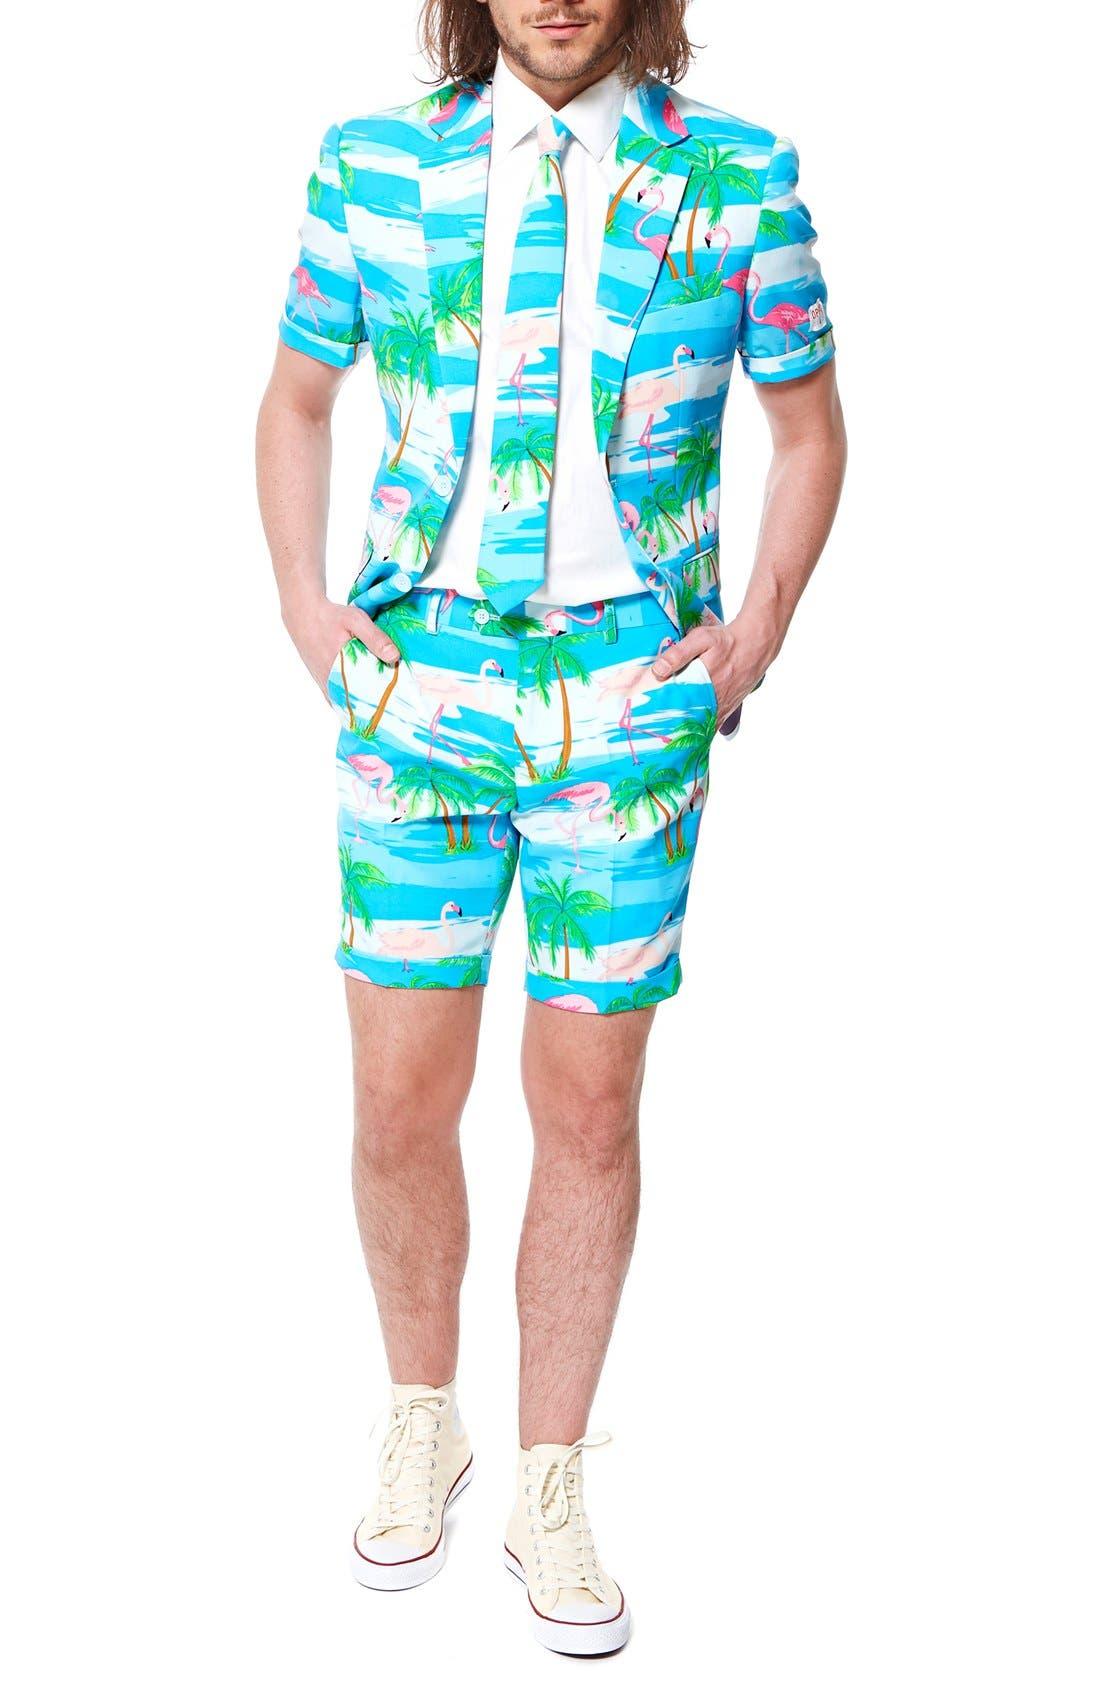 'Flaminguy - Summer' Trim Fit Two-Piece Short Suit with Tie,                         Main,                         color, Blue